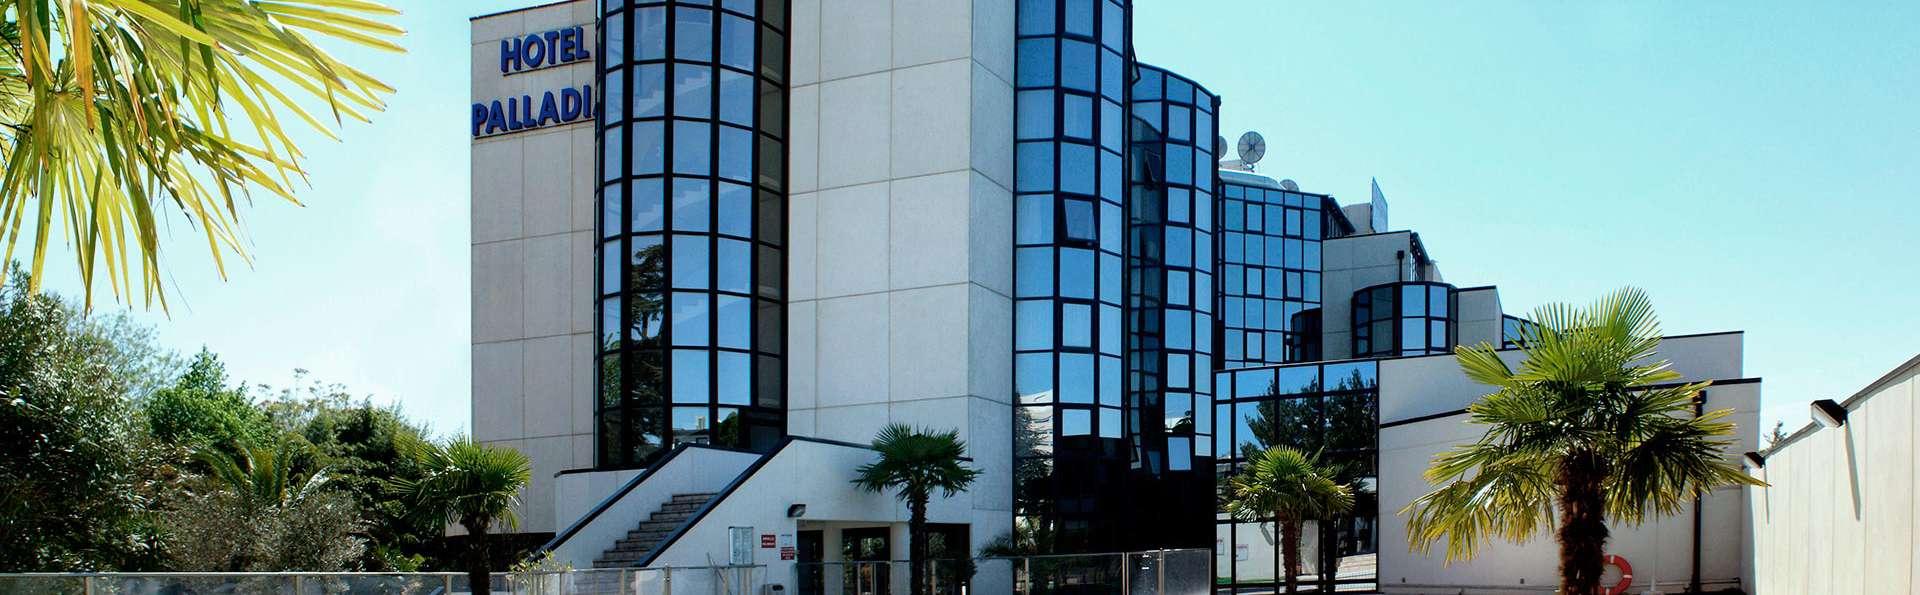 Hôtel Palladia - EDIT_poolfront.jpg